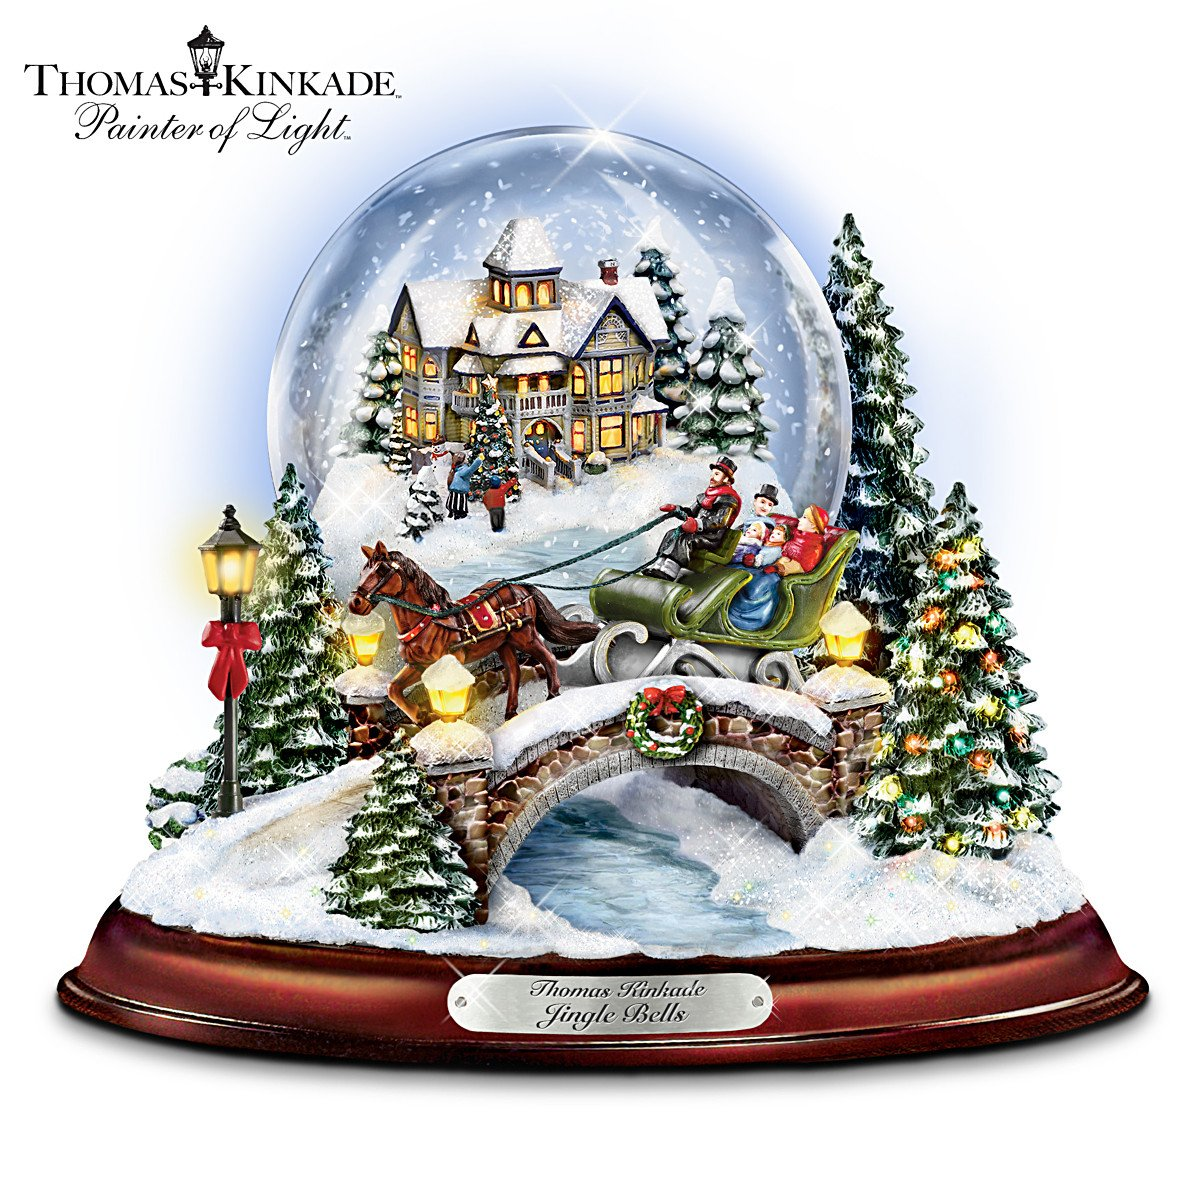 Thomas Kinkade Jingle Bells Illuminated Musical Christmas Snowglobe by The Bradford Exchange